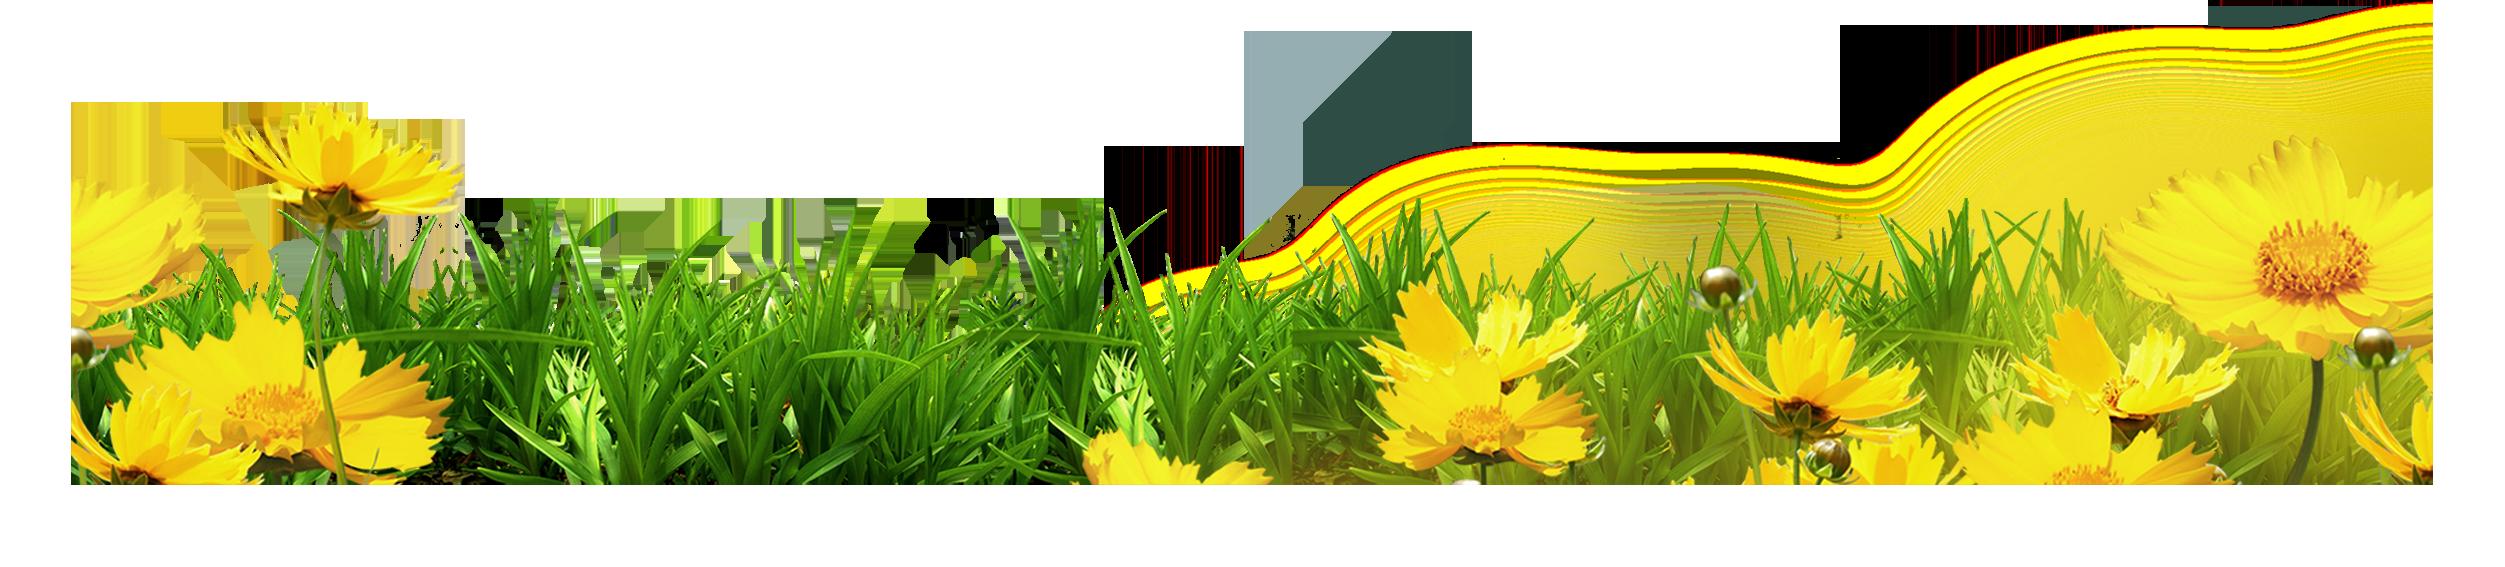 Clipart grass template. Clip art yellow floral